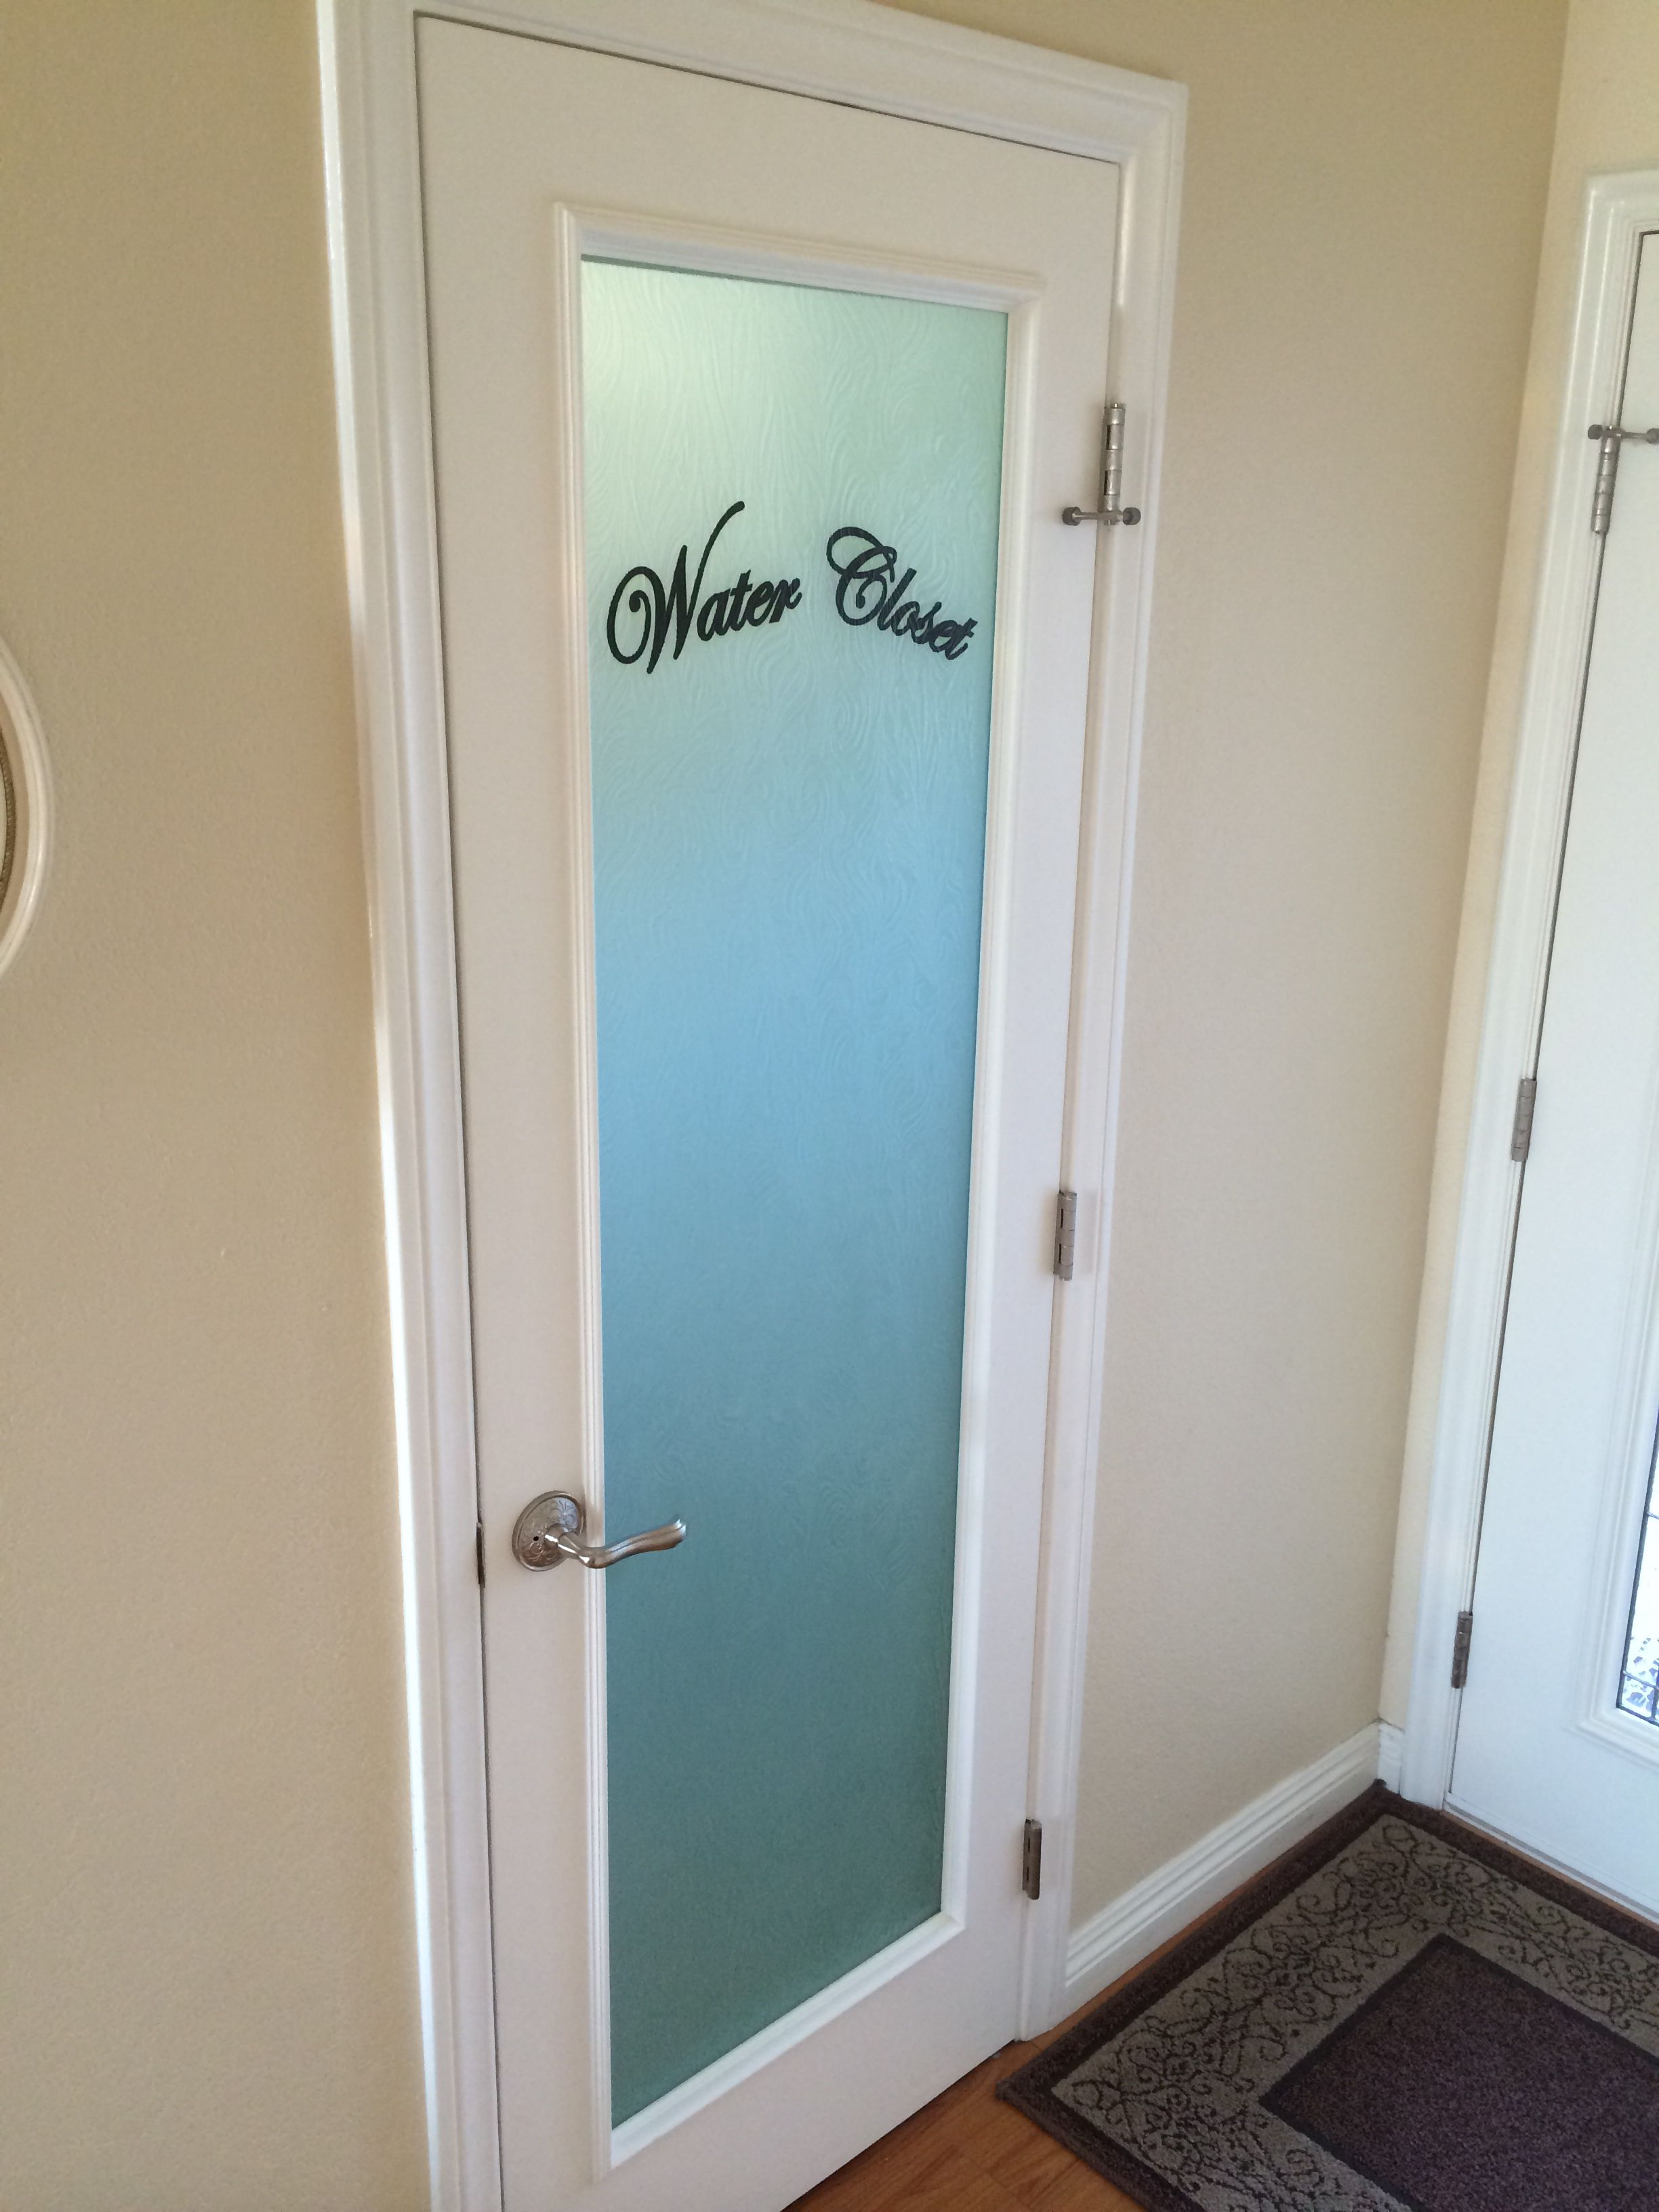 Bathroom Water Closet Door Panel Laminated Glass Using A